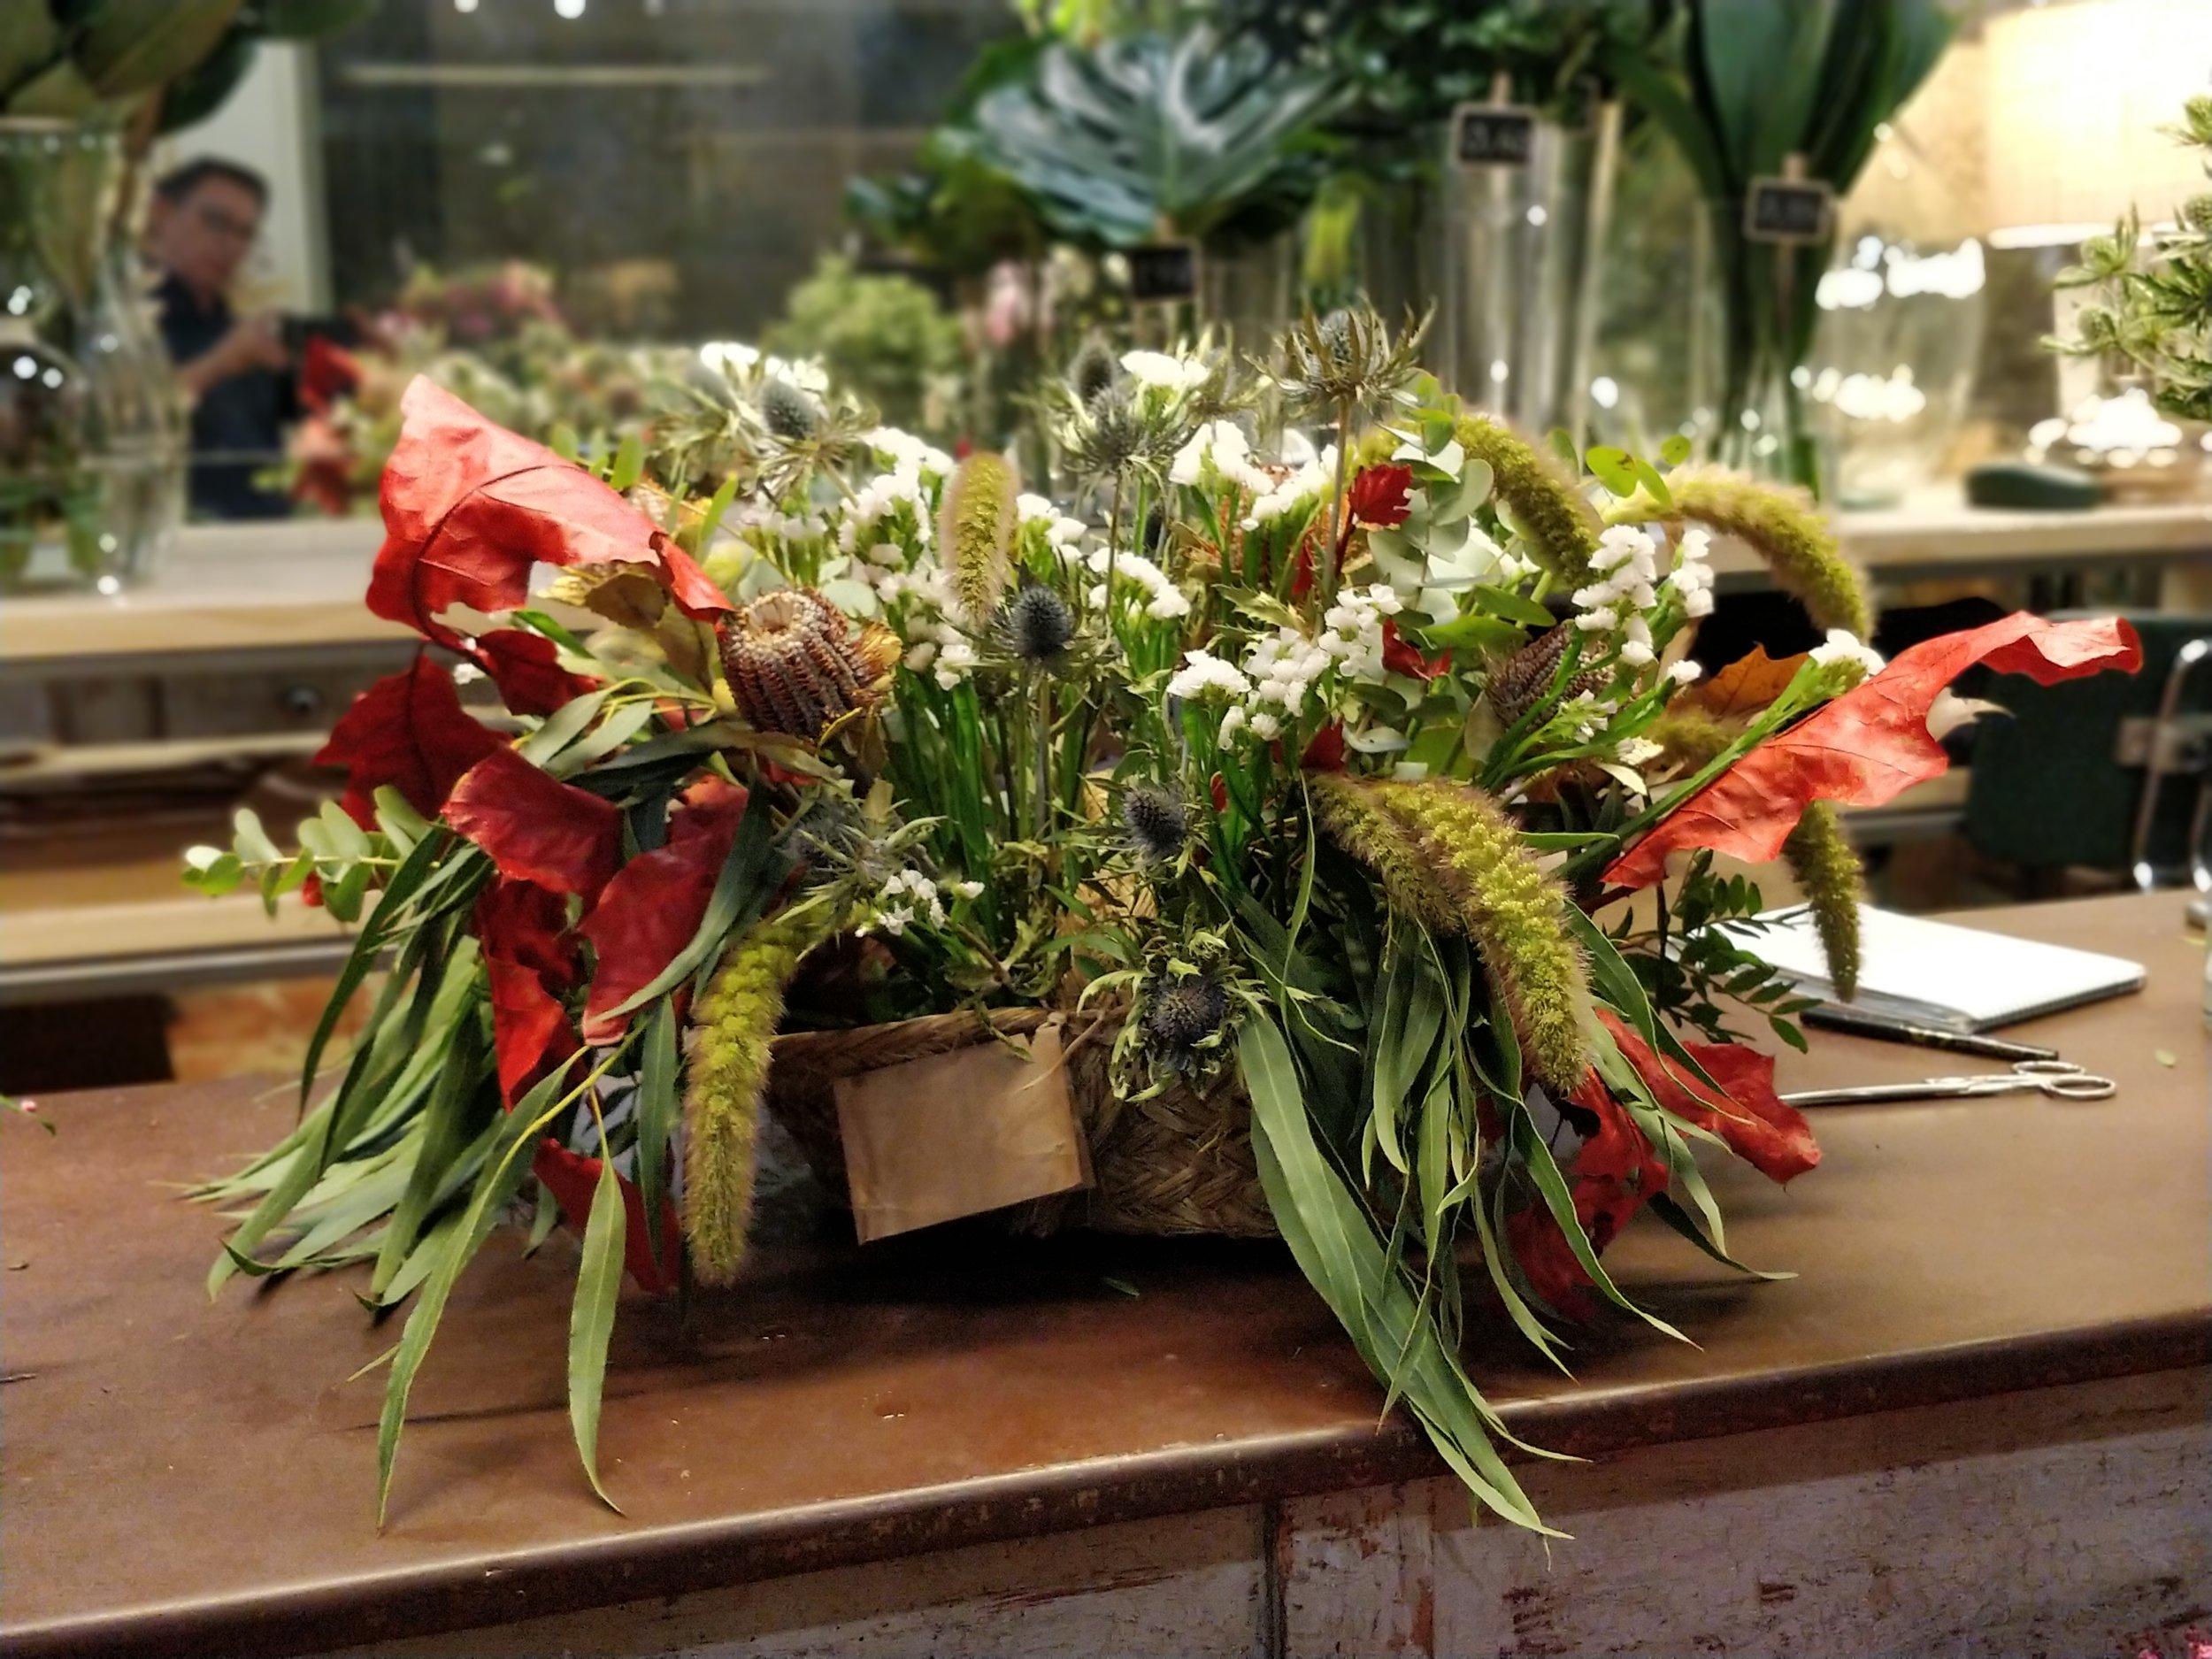 centro cesta flores.jpg